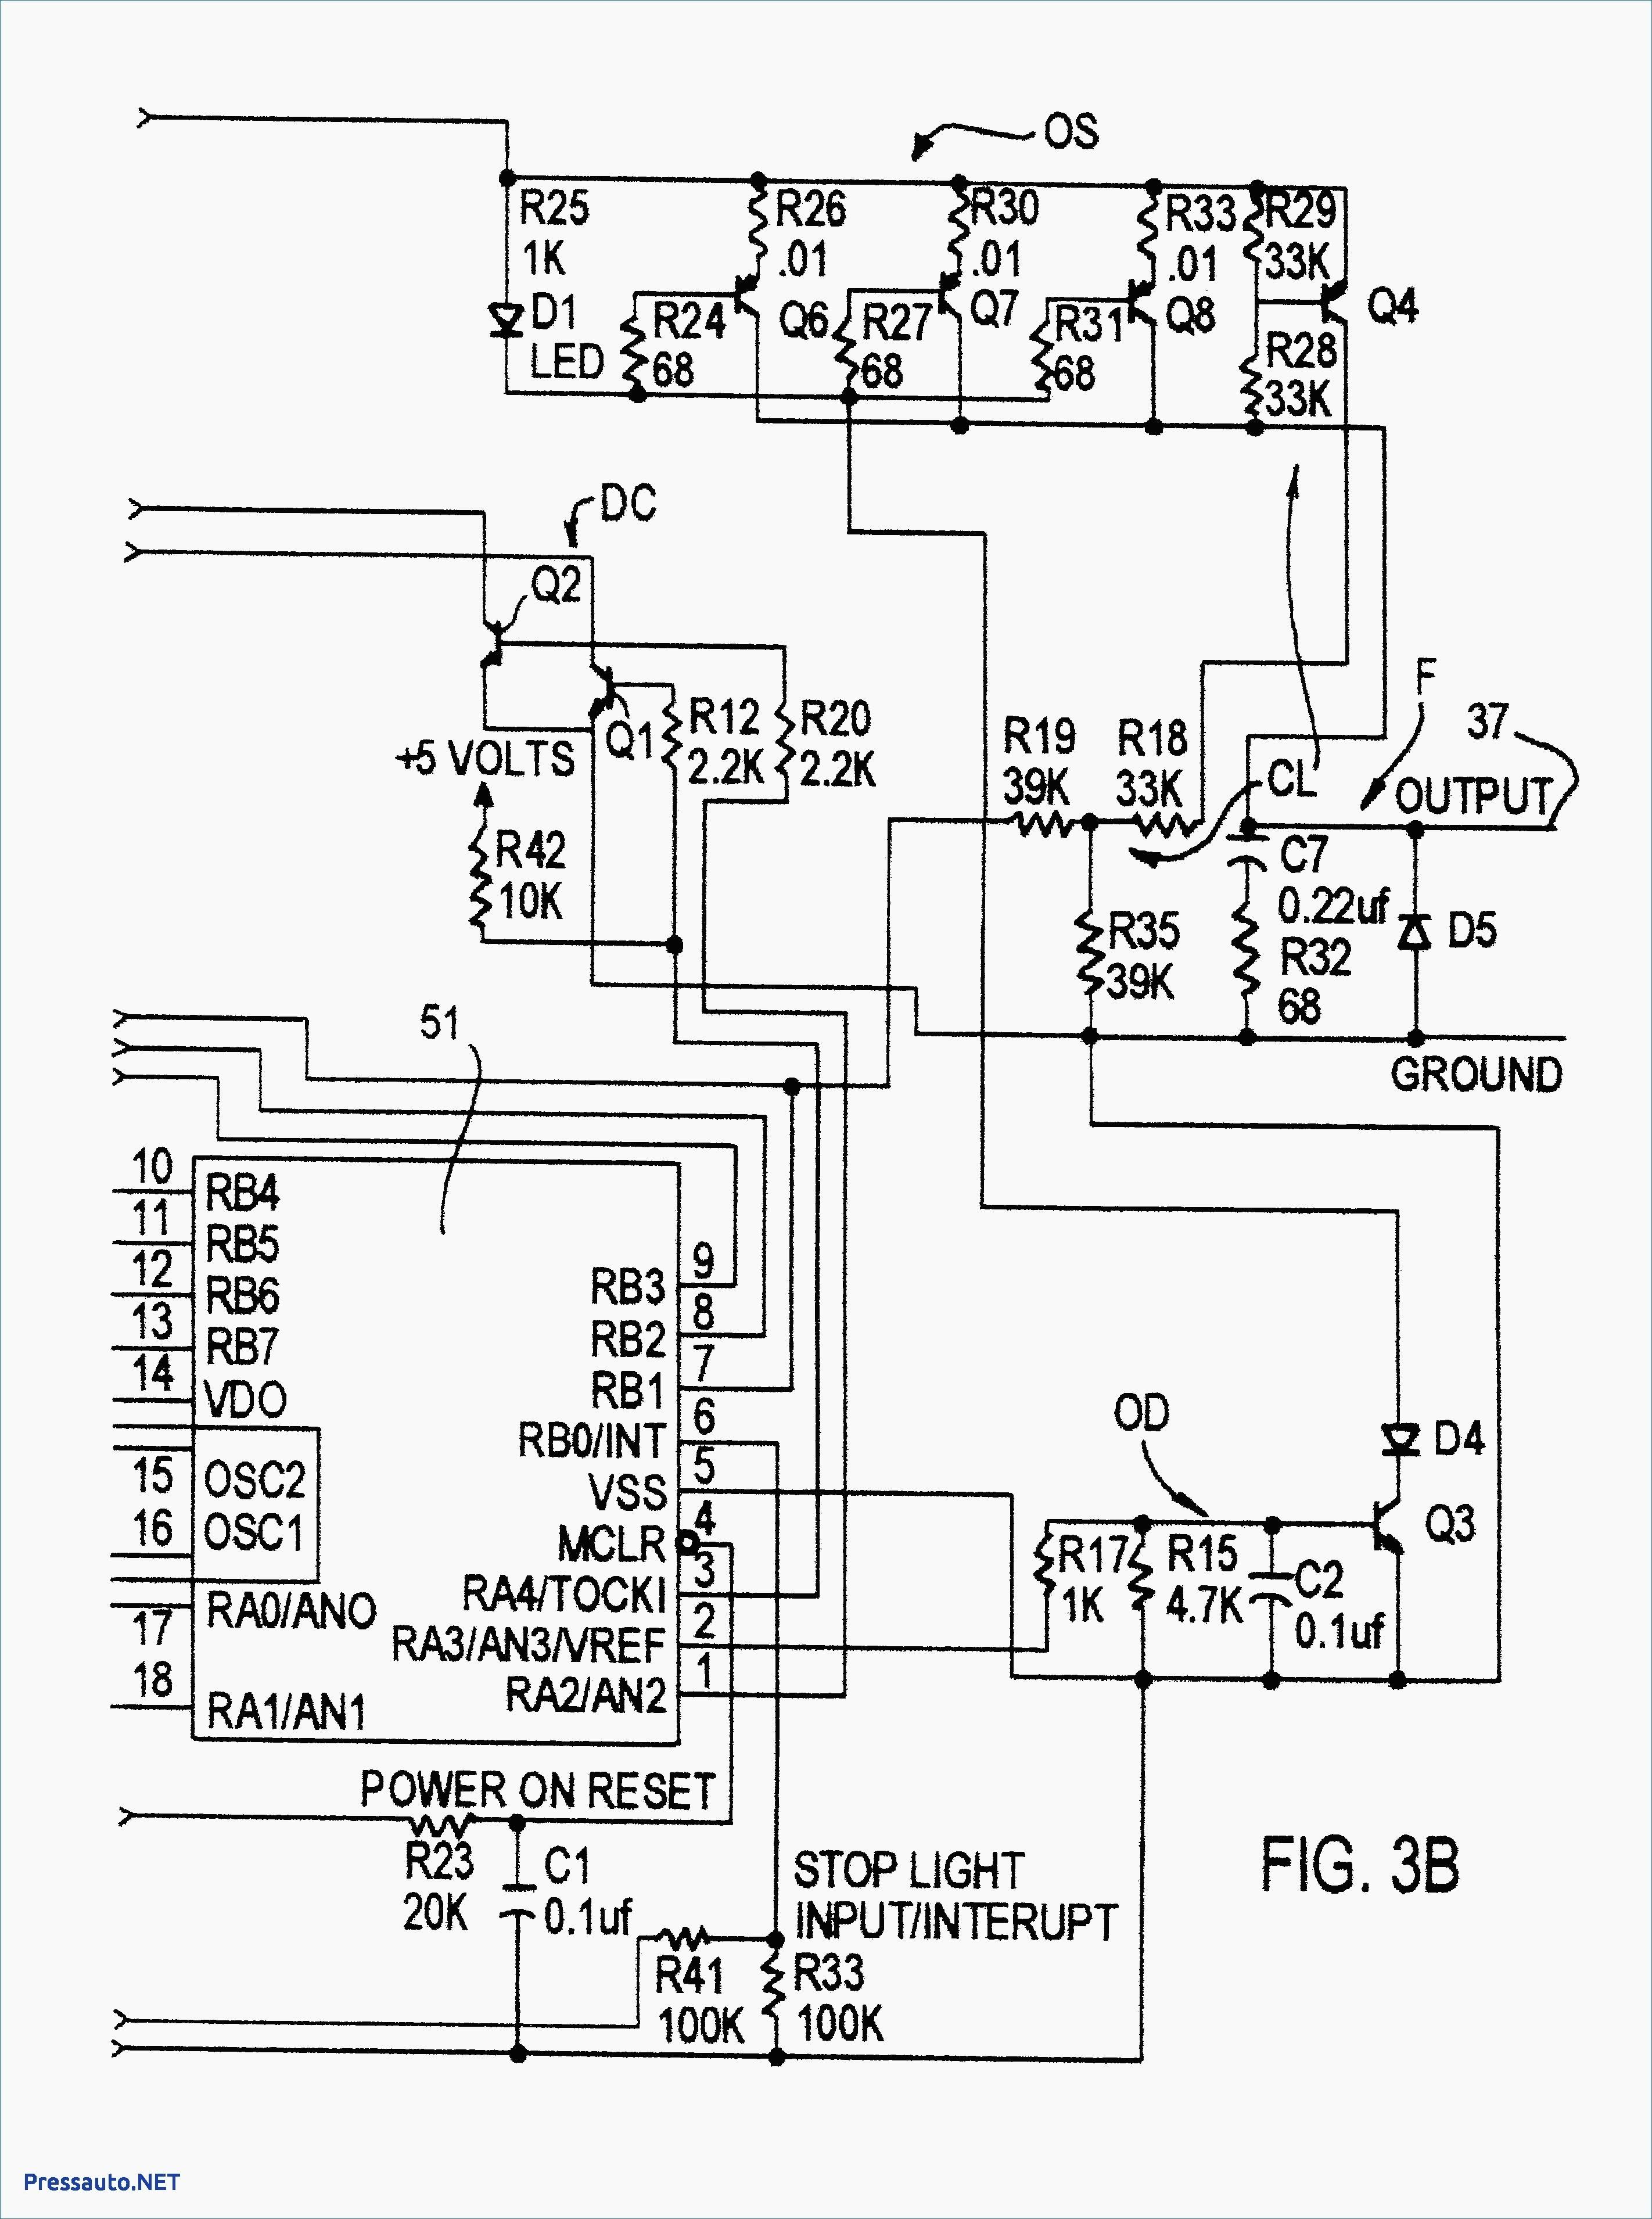 Humbucker Wiring Diagram Elegant | Wiring Diagram Image